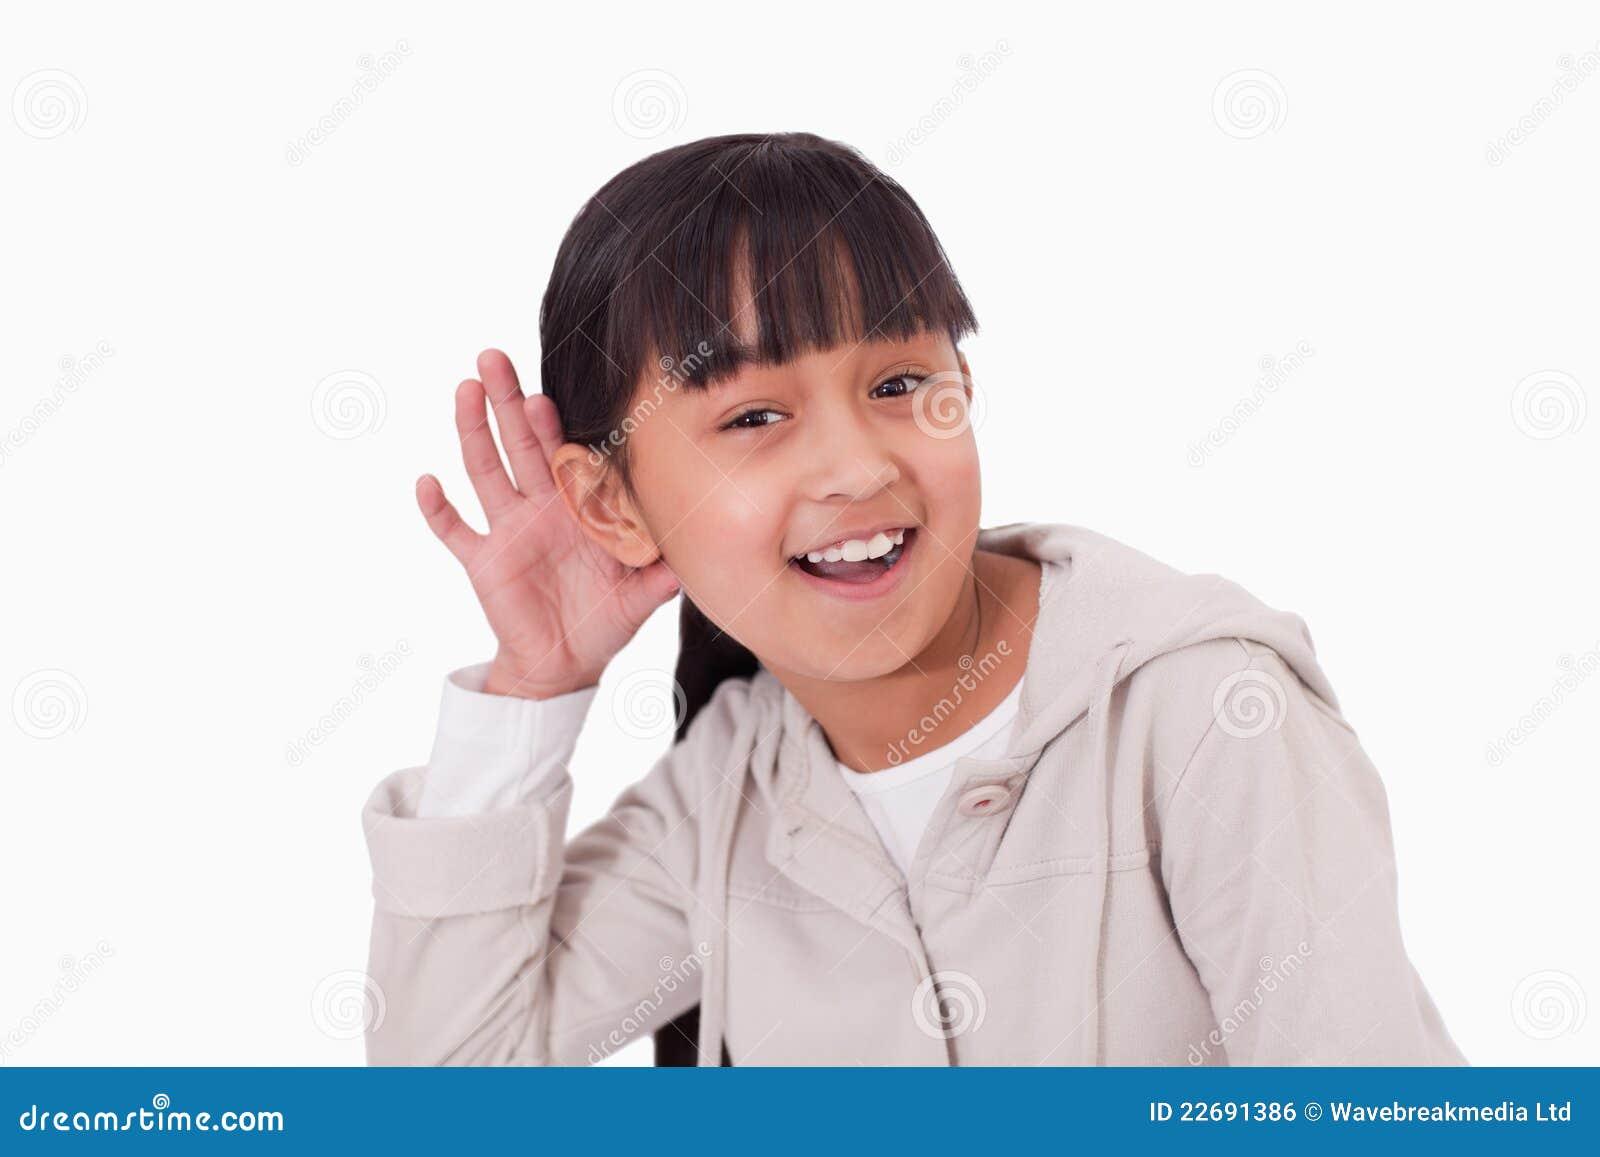 Girl pricking up her ear